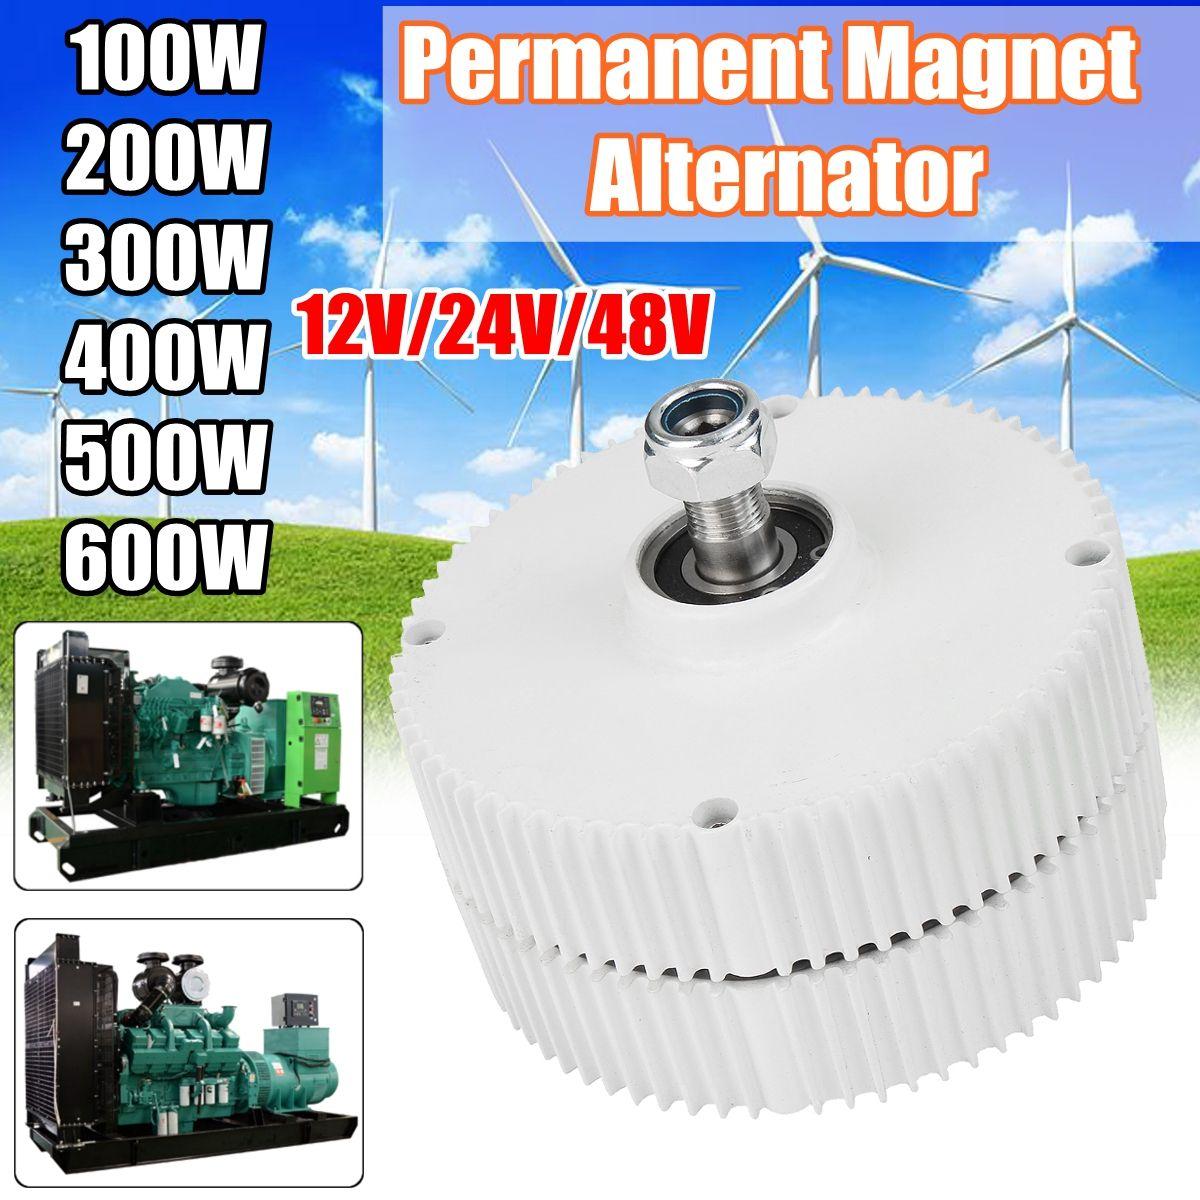 600W 12/24/48V Permanent Magnet Synchronous Motor Generator Wind Wind T urbine